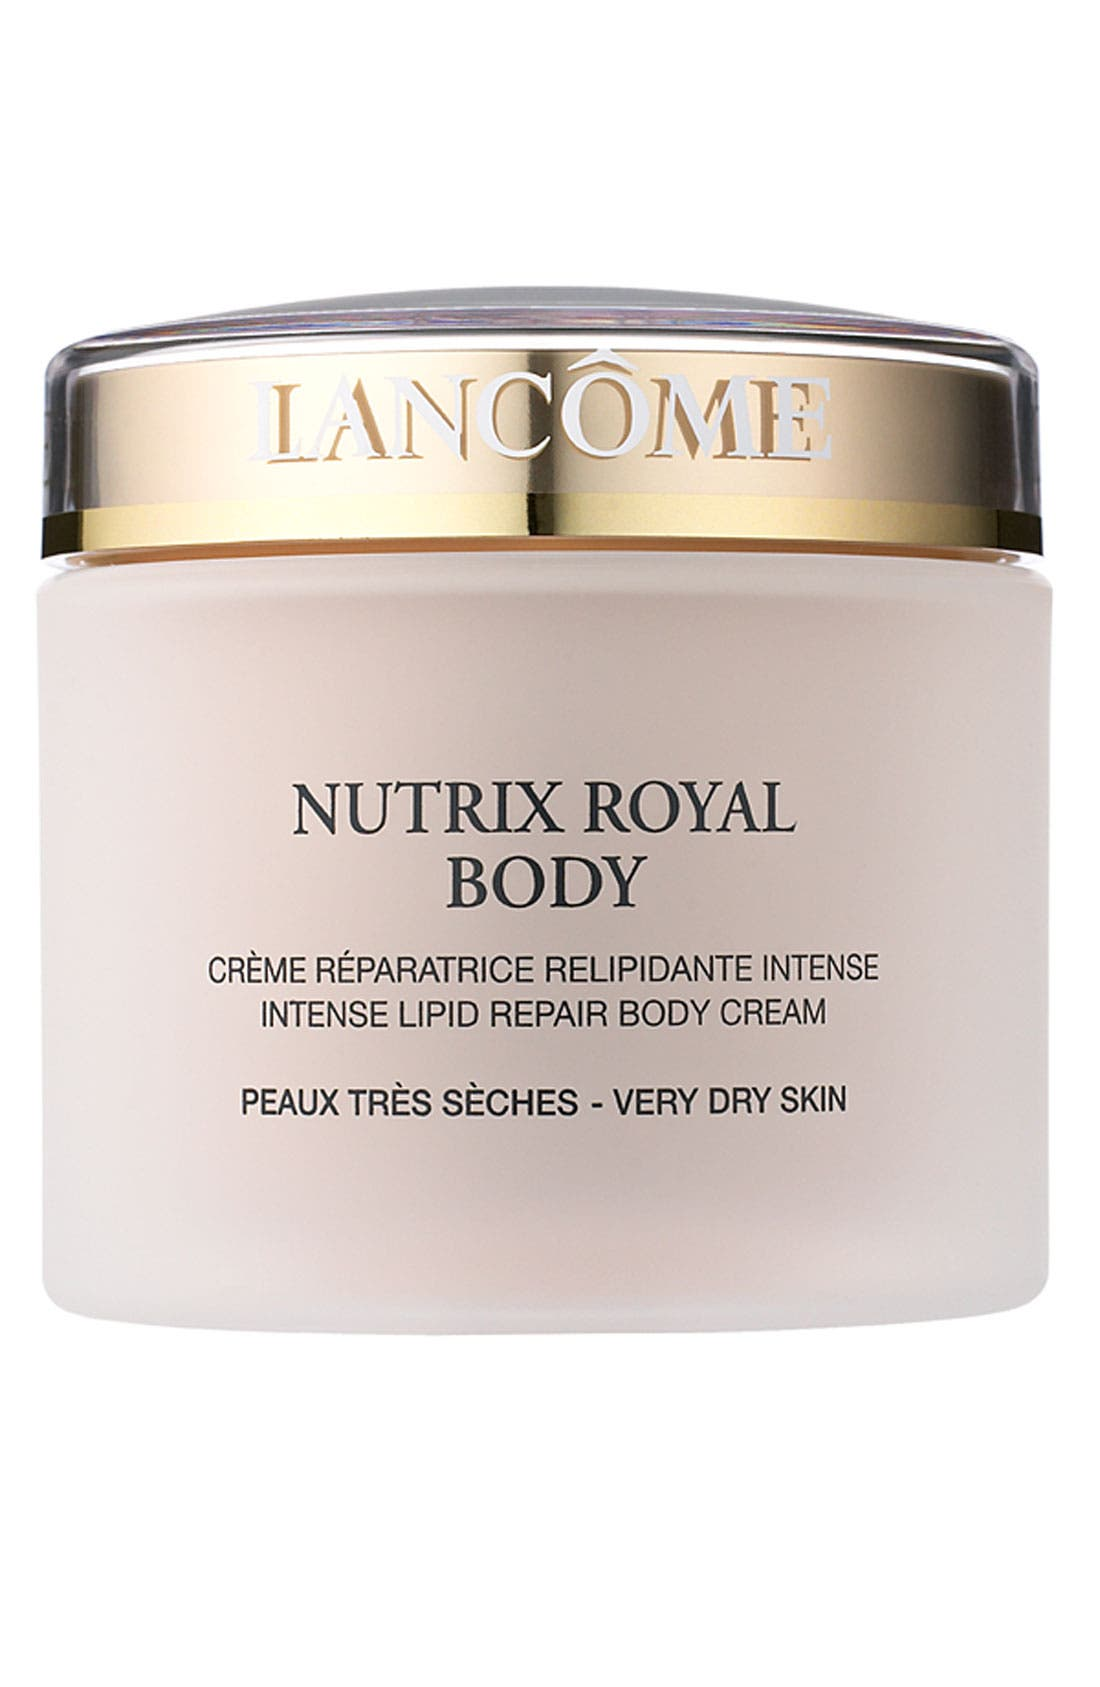 Nutrix Royal Body Nourishing Moisturizer Cream,                             Main thumbnail 1, color,                             NO COLOR